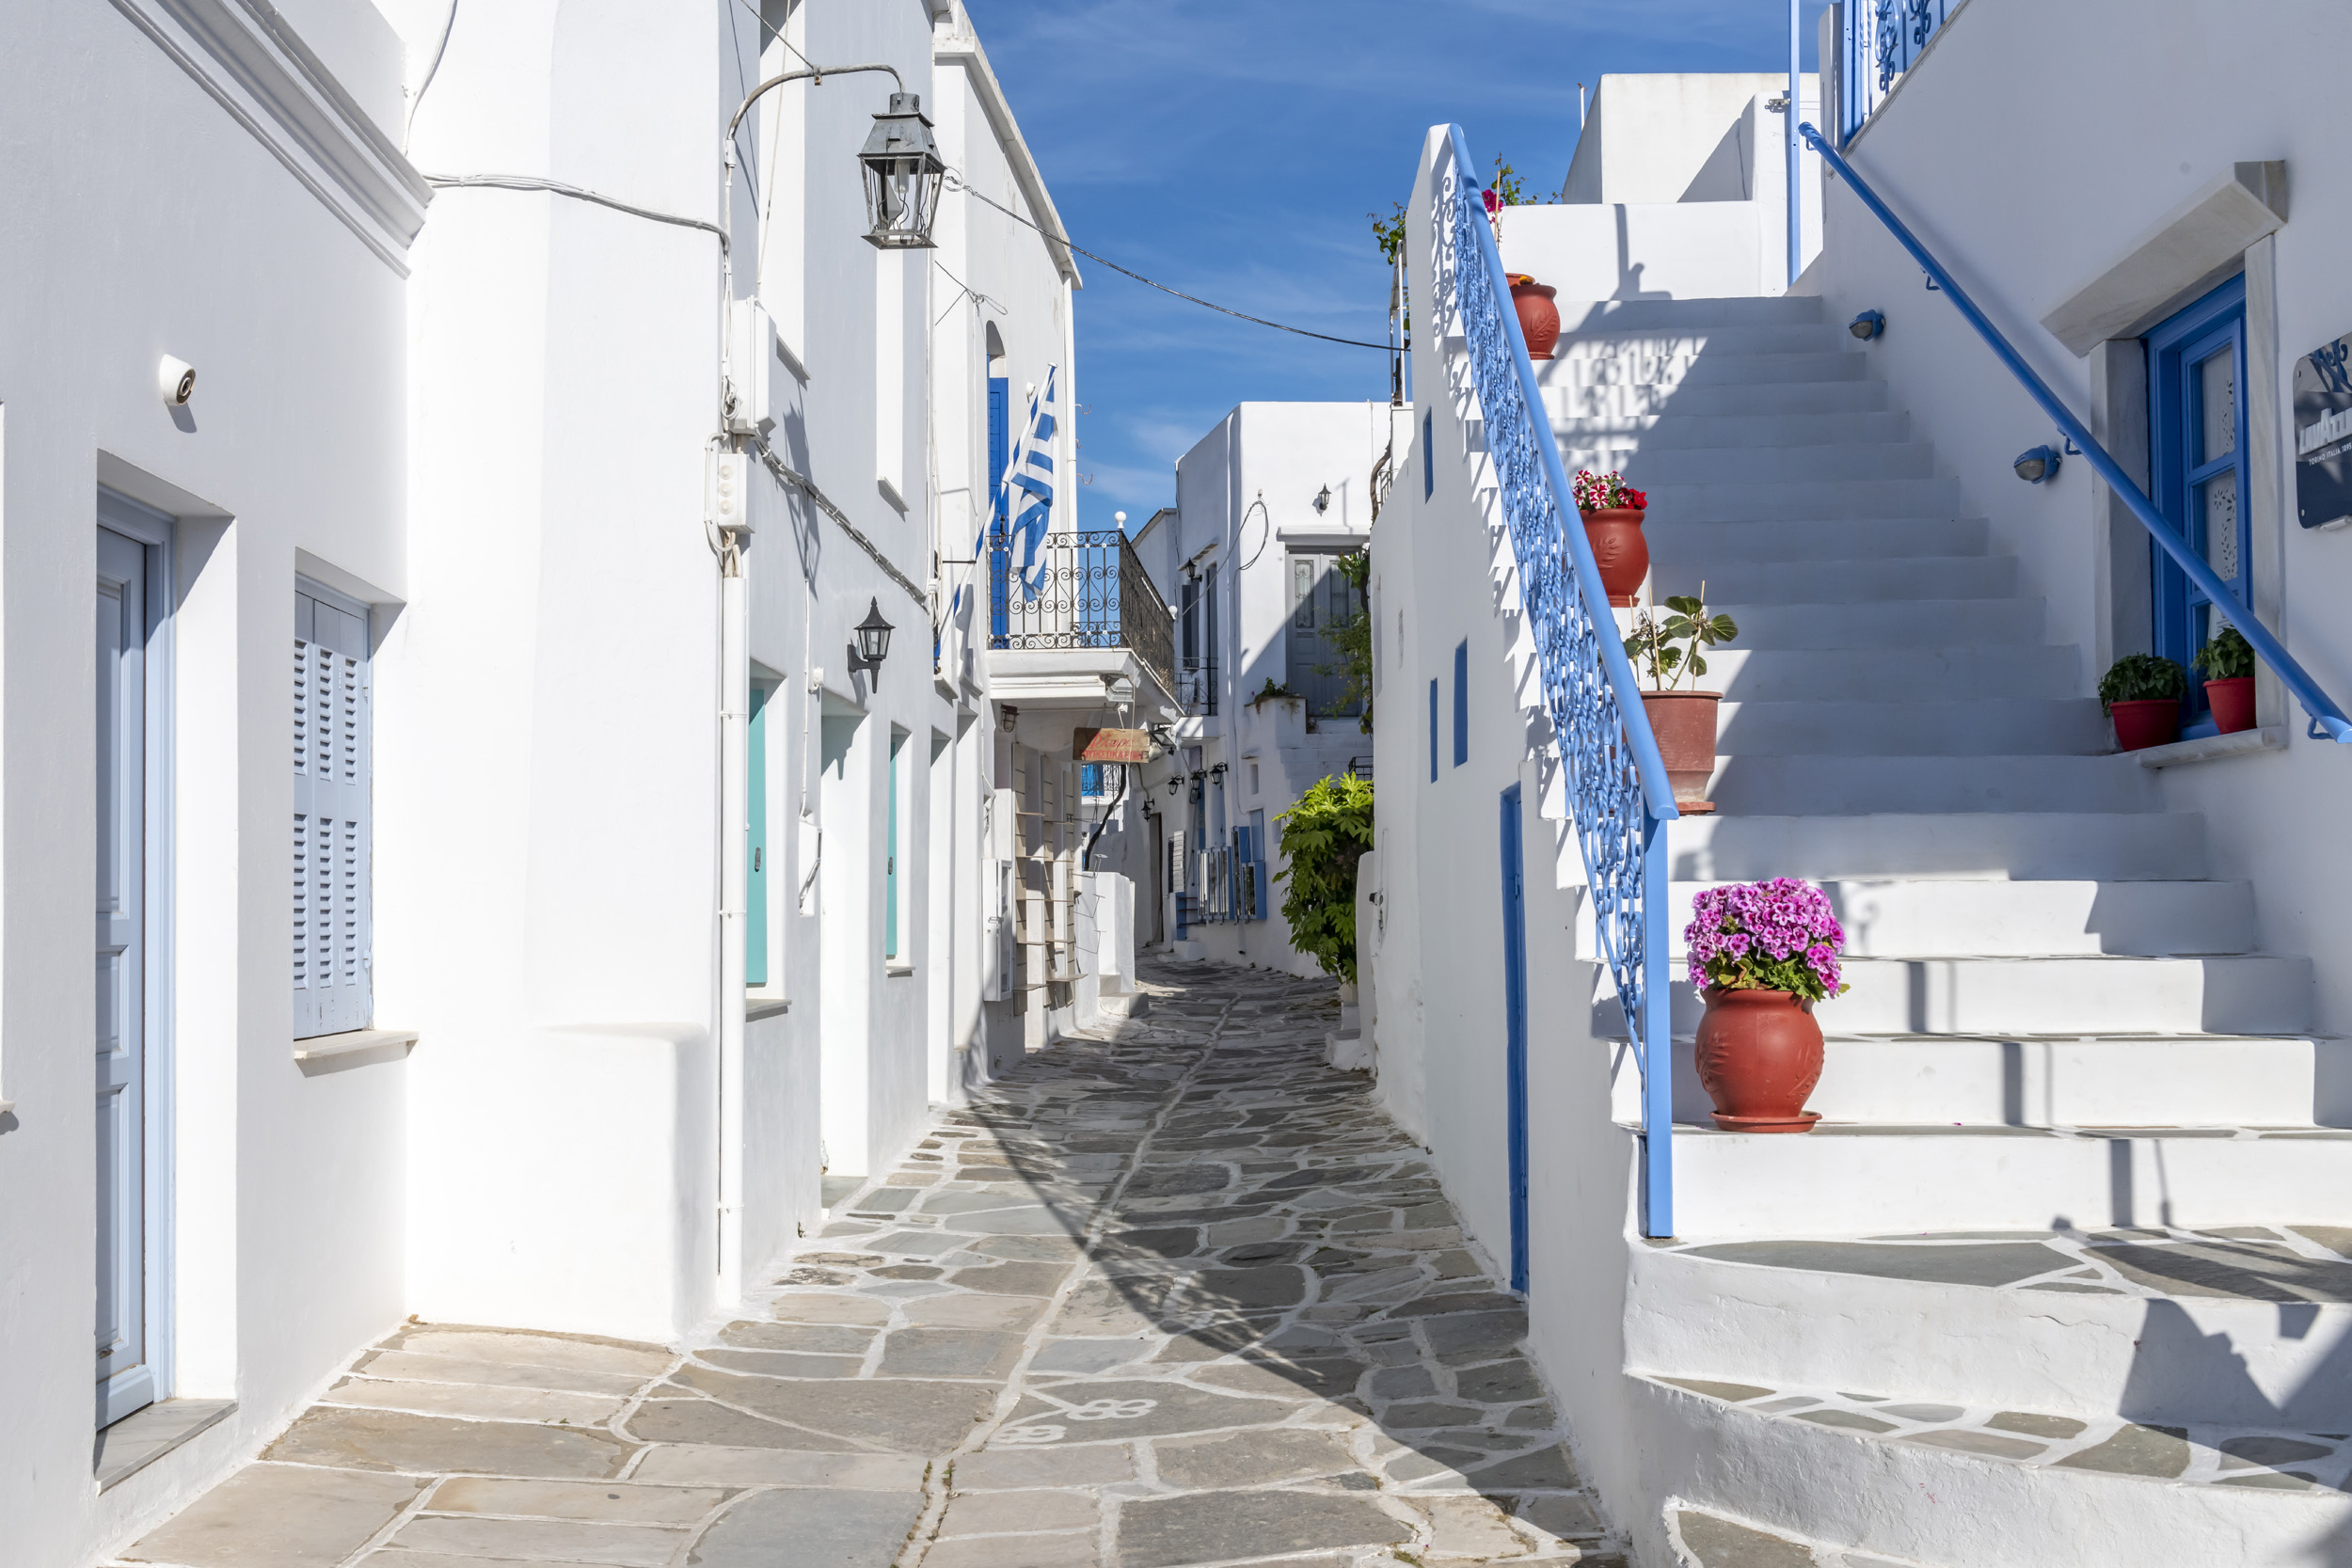 Streets of Paros - Paros, Greece